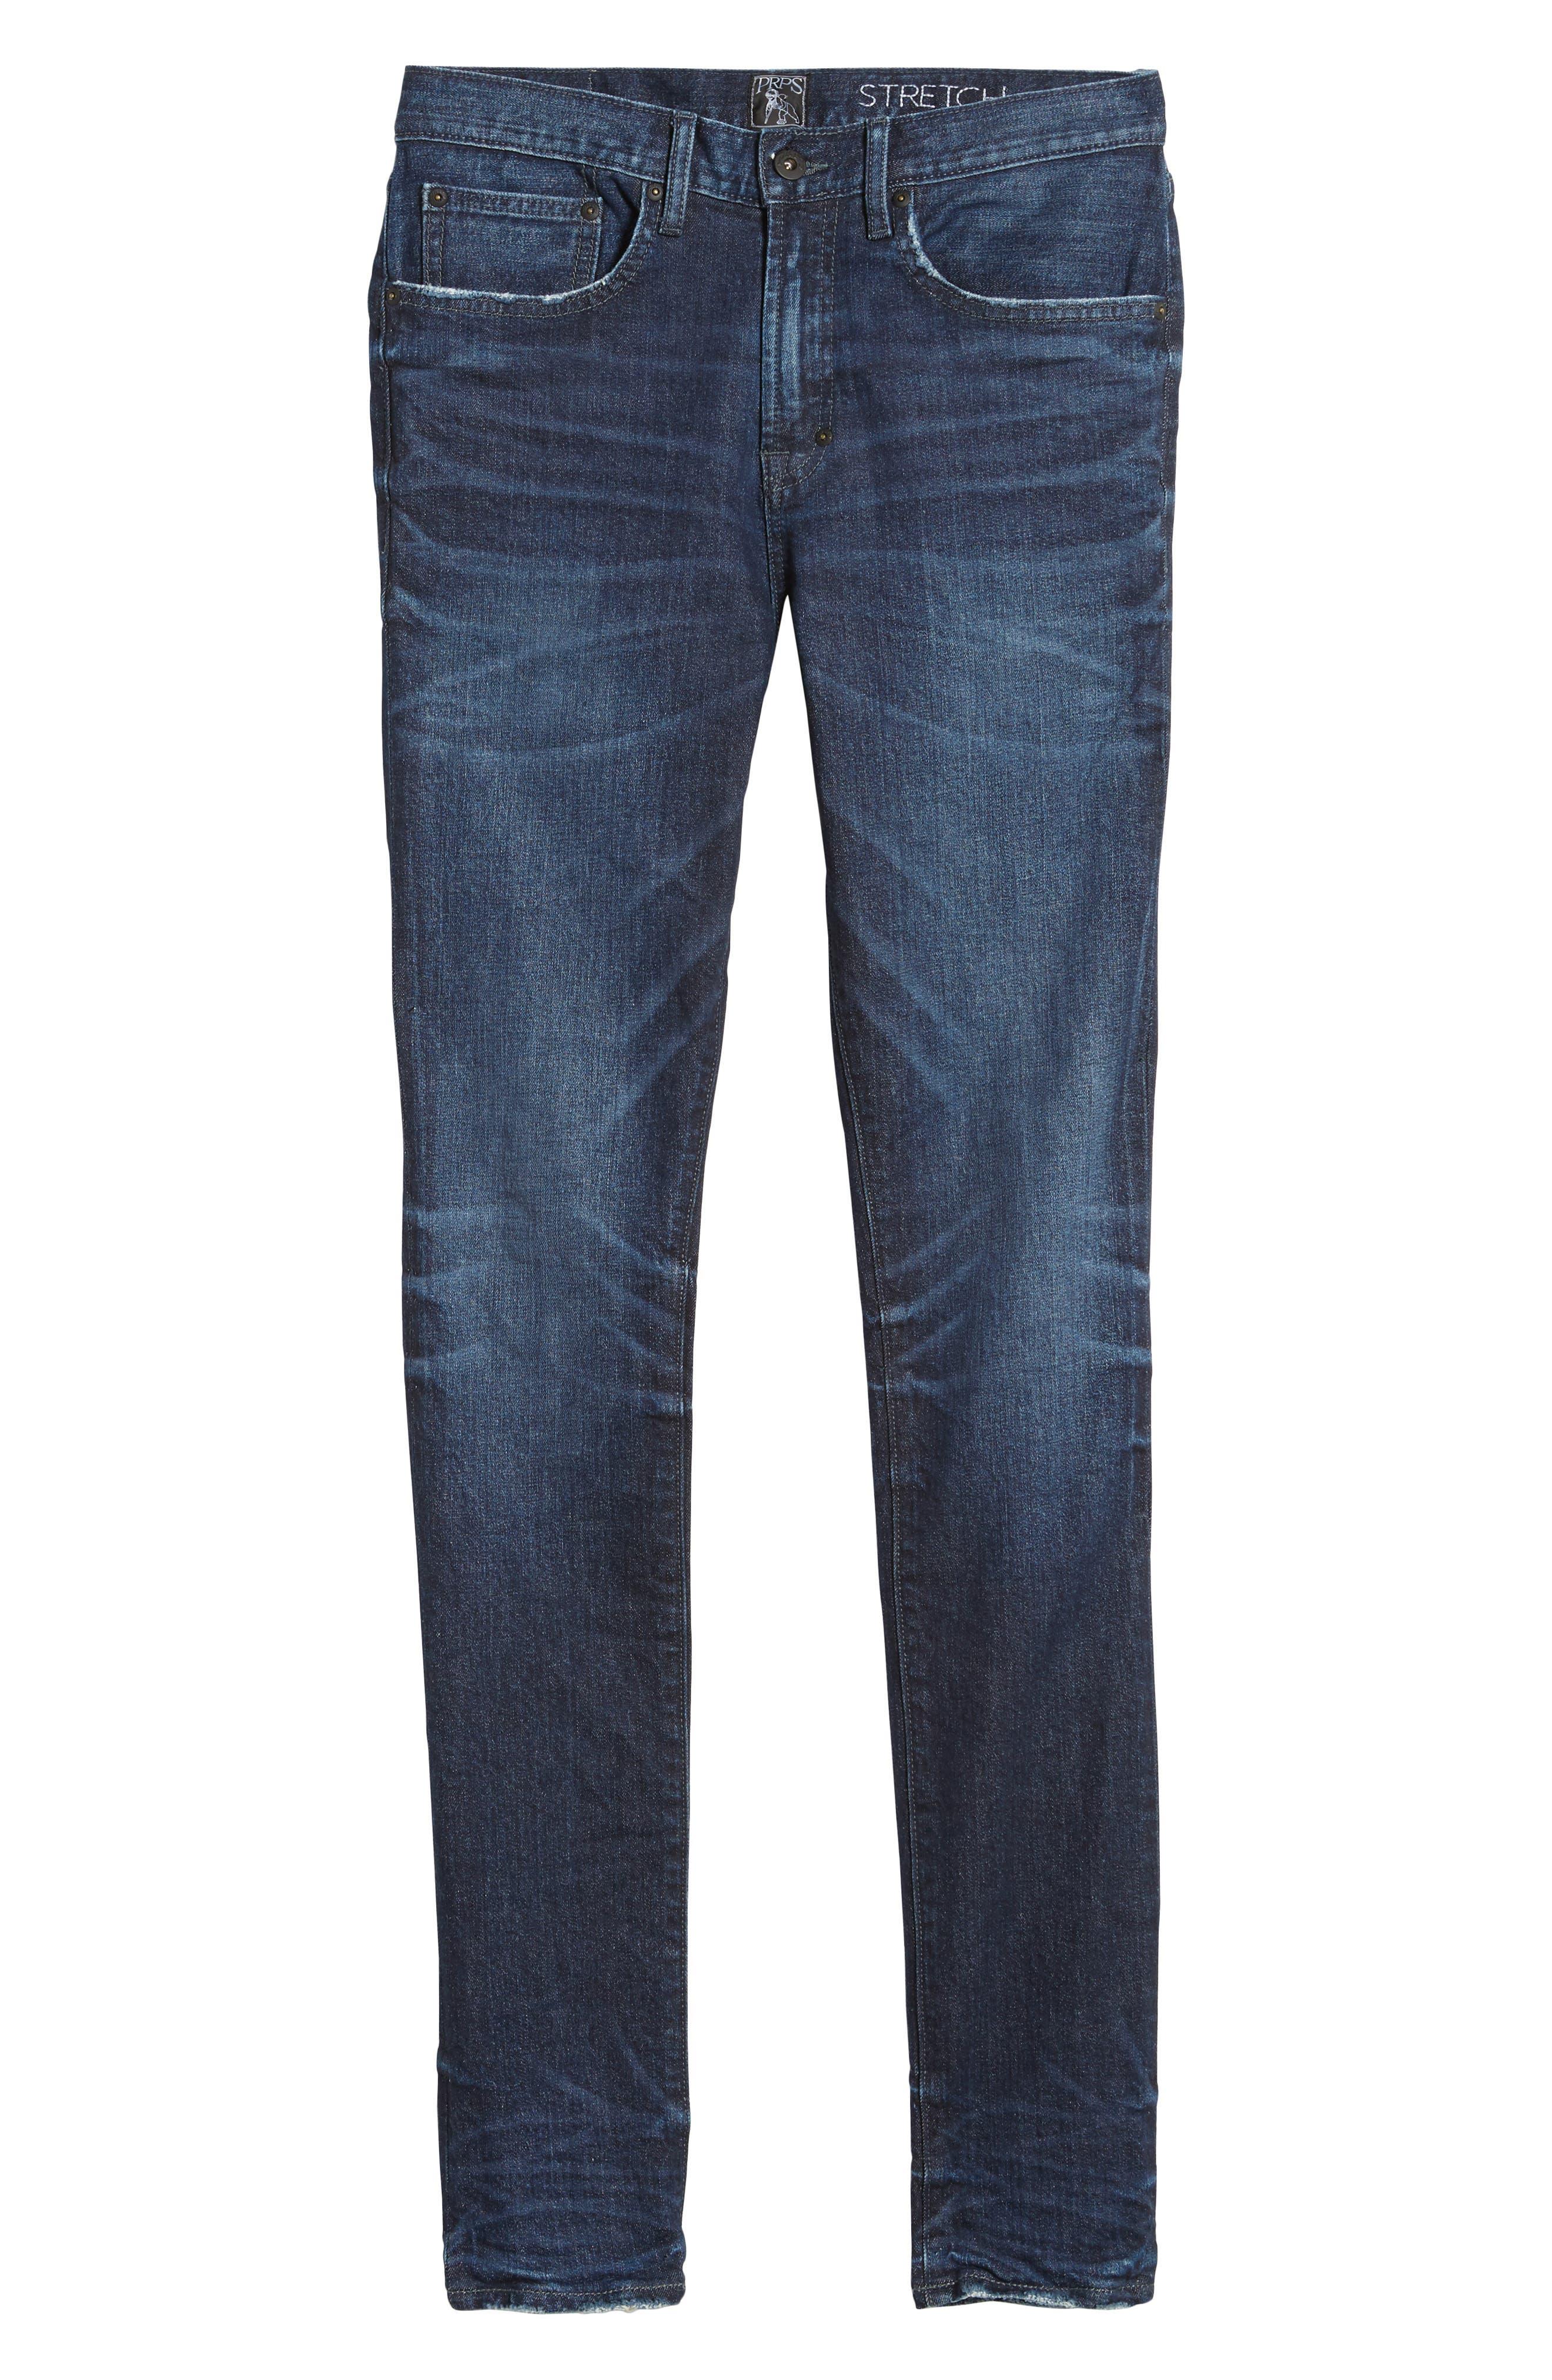 Windsor Slim Fit Jeans,                             Alternate thumbnail 6, color,                             Dark Blue